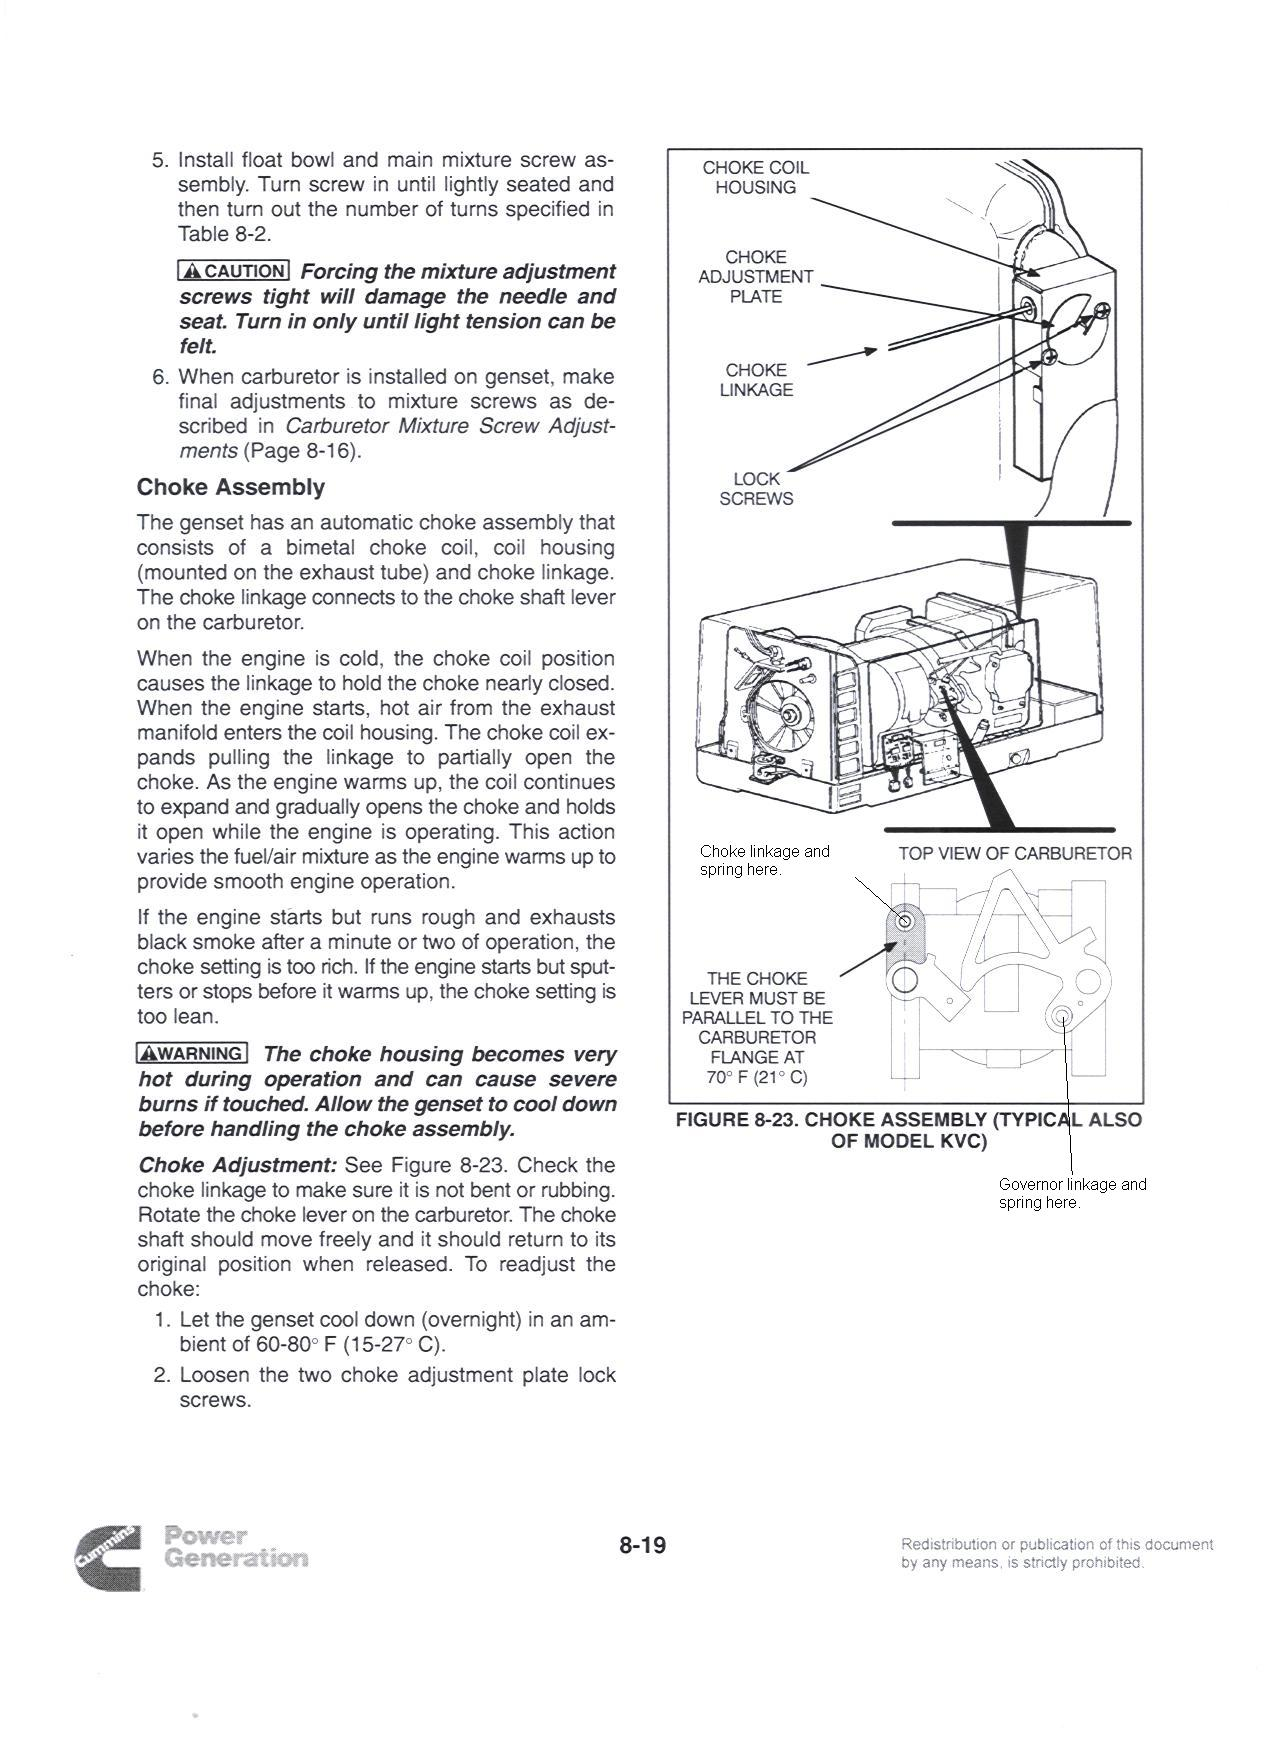 2011 09 13_163214_kv_carb onan microlite 4000 generator parts onan free image about wiring onan 2800 microlite generator wiring diagram at readyjetset.co